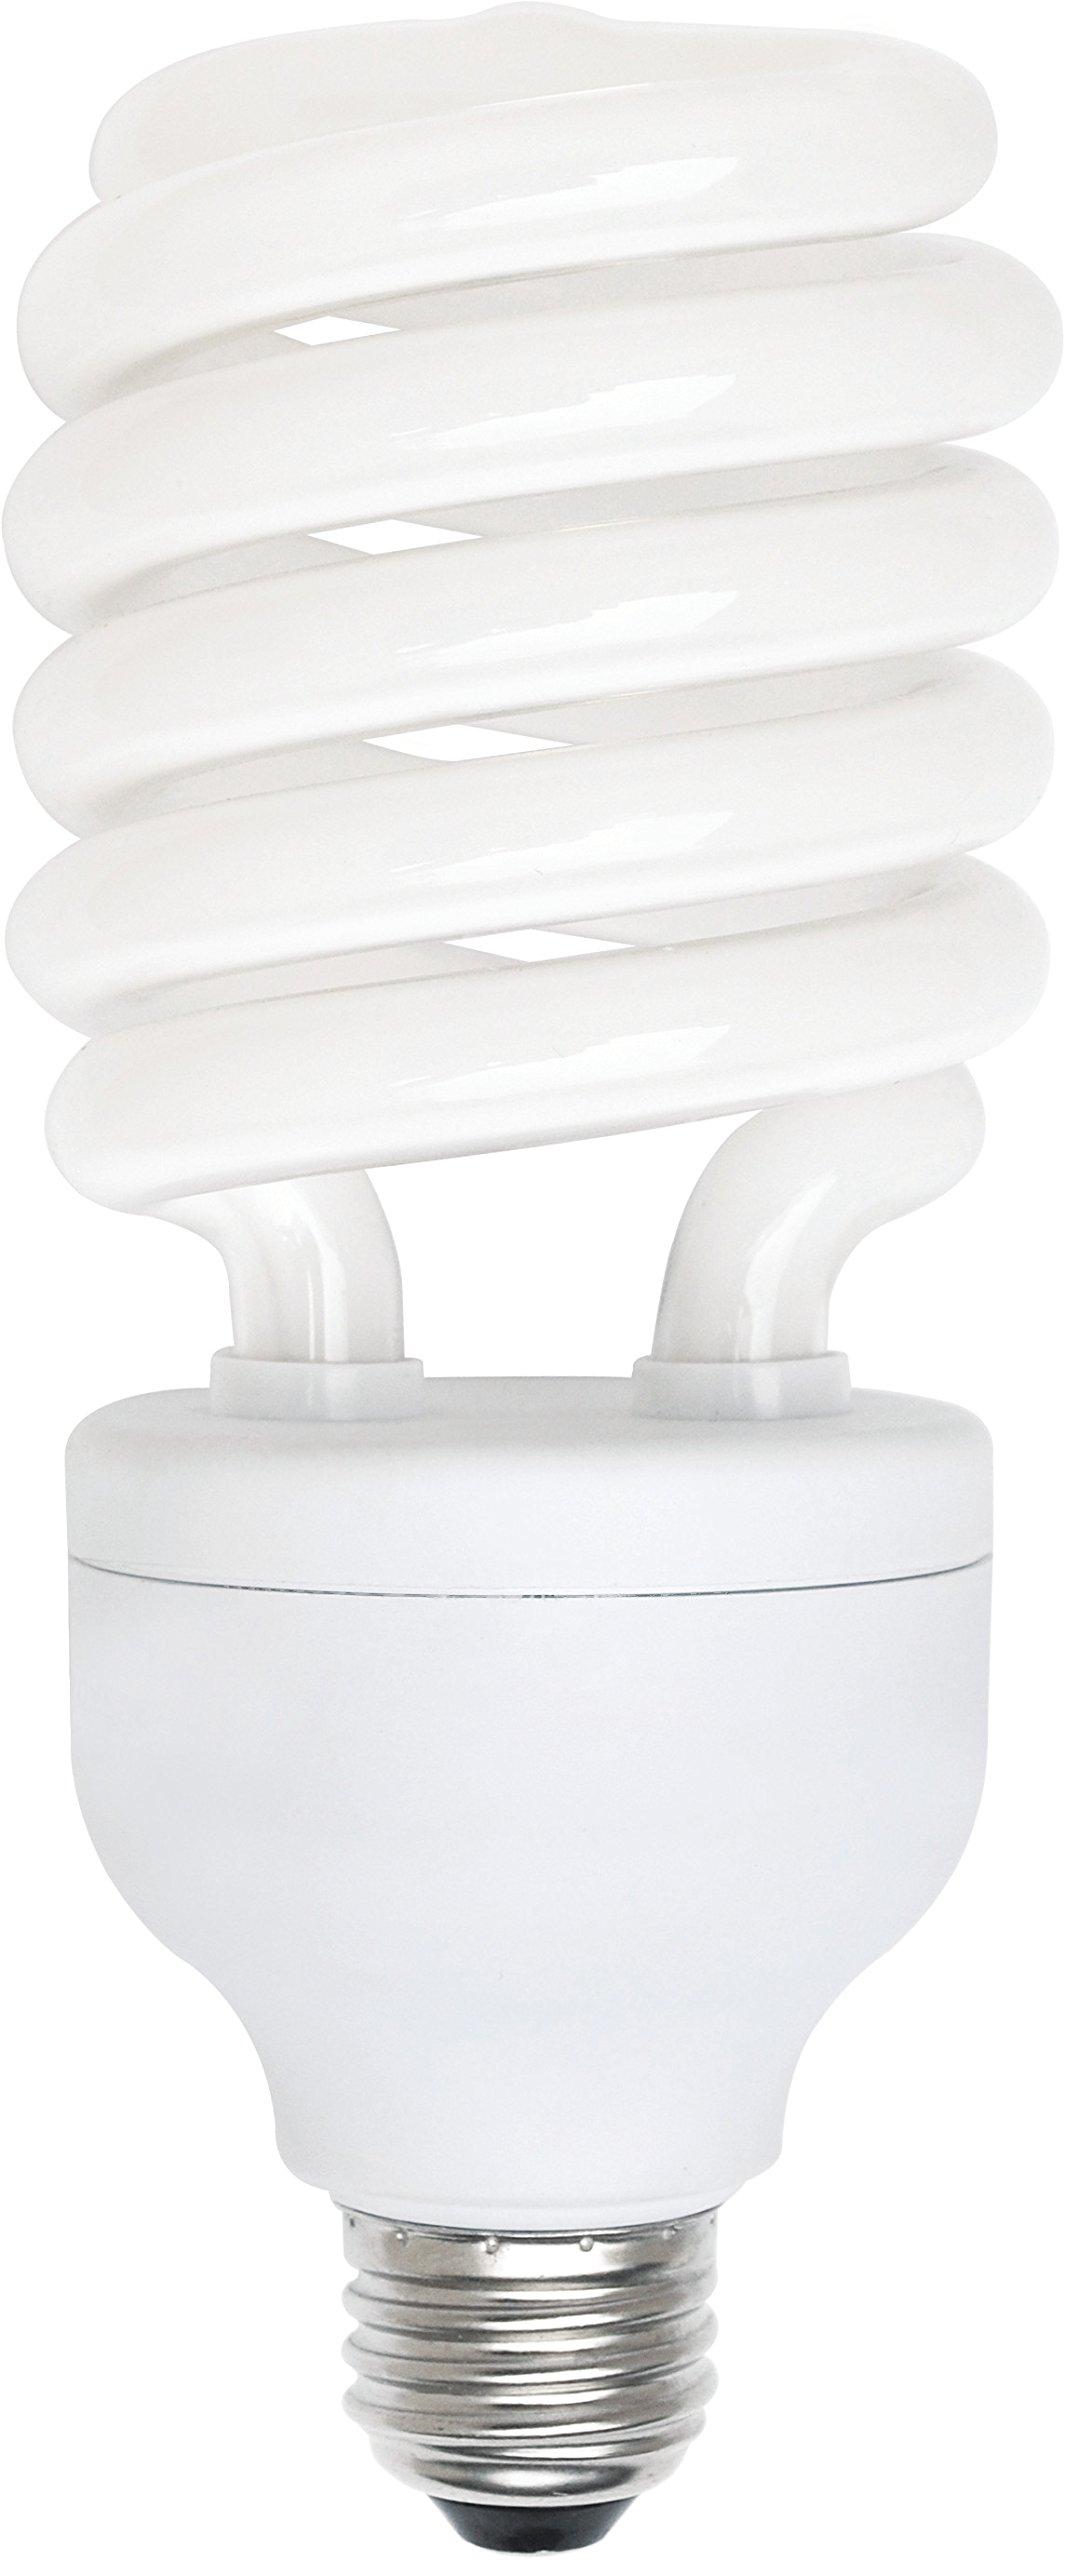 Luxrite LR20210 (12-Pack) 42-Watt CFL T3 Spiral Light Bulb, Equivalent To 200W Incandescent, Warm White 2700K, 2820 Lumens, E26 Standard Base